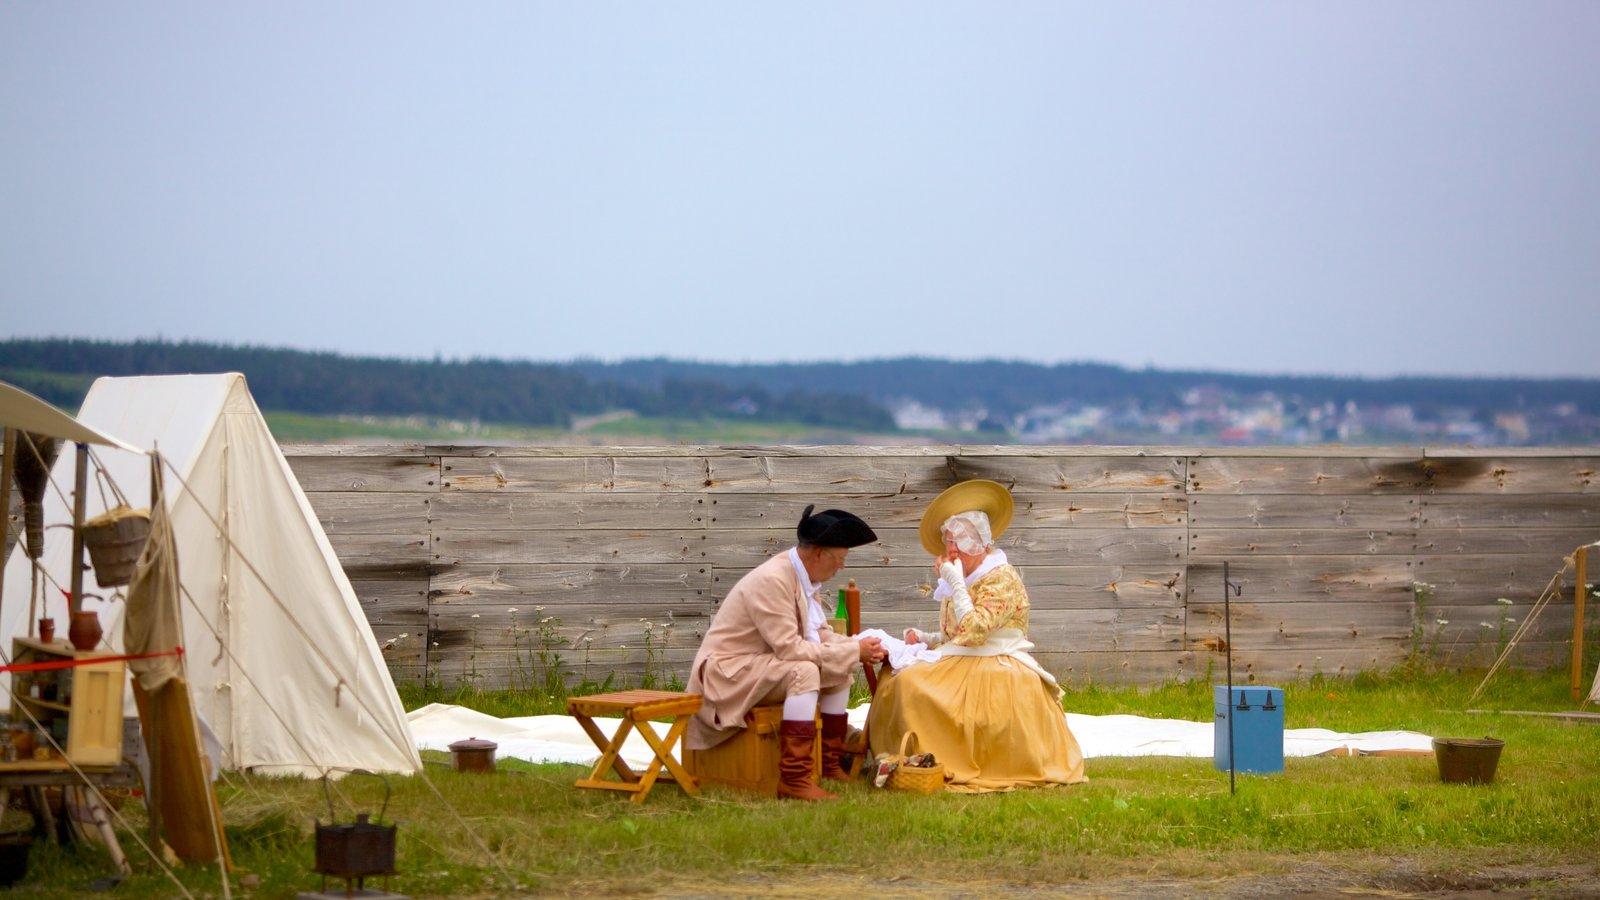 Fortress Louisbourg National Historic Site caracterizando elementos de patrimônio